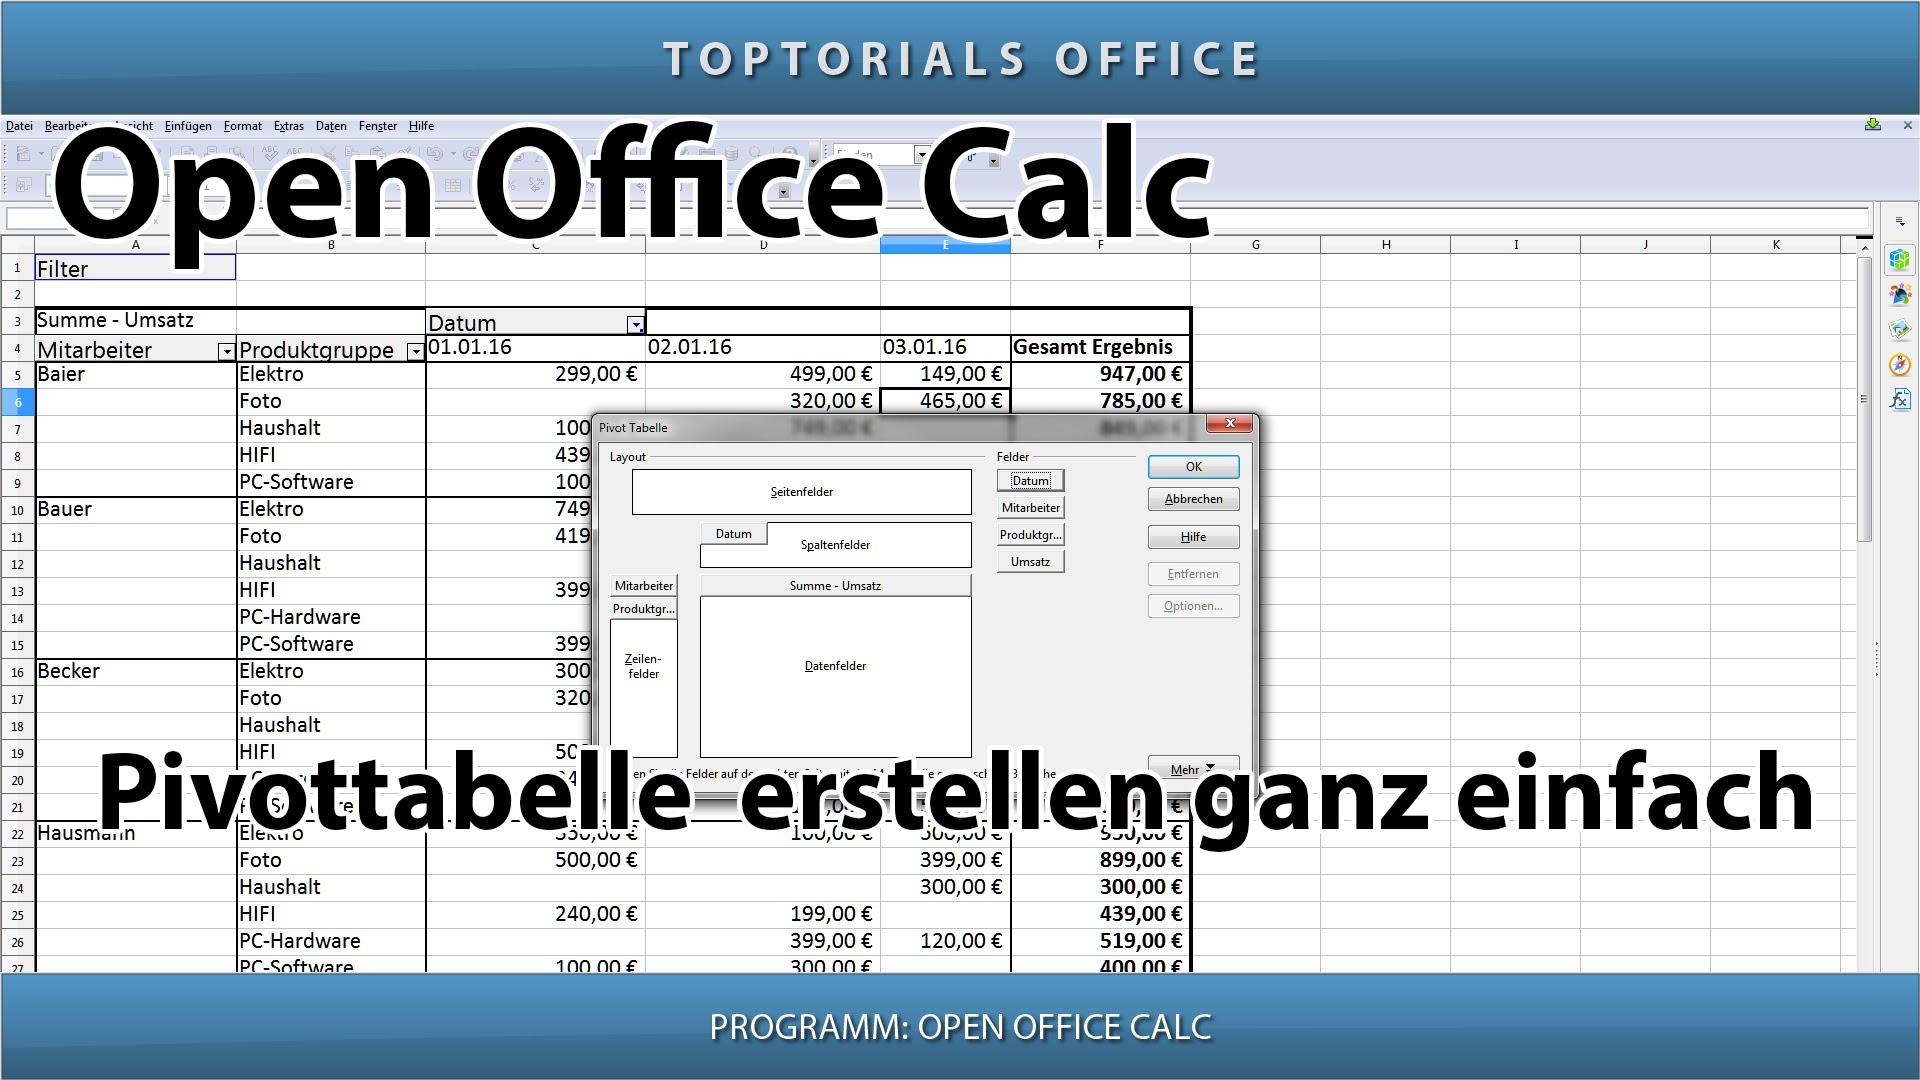 Pivot tabelle erstellen total einfach openoffice calc for Tabelle open office